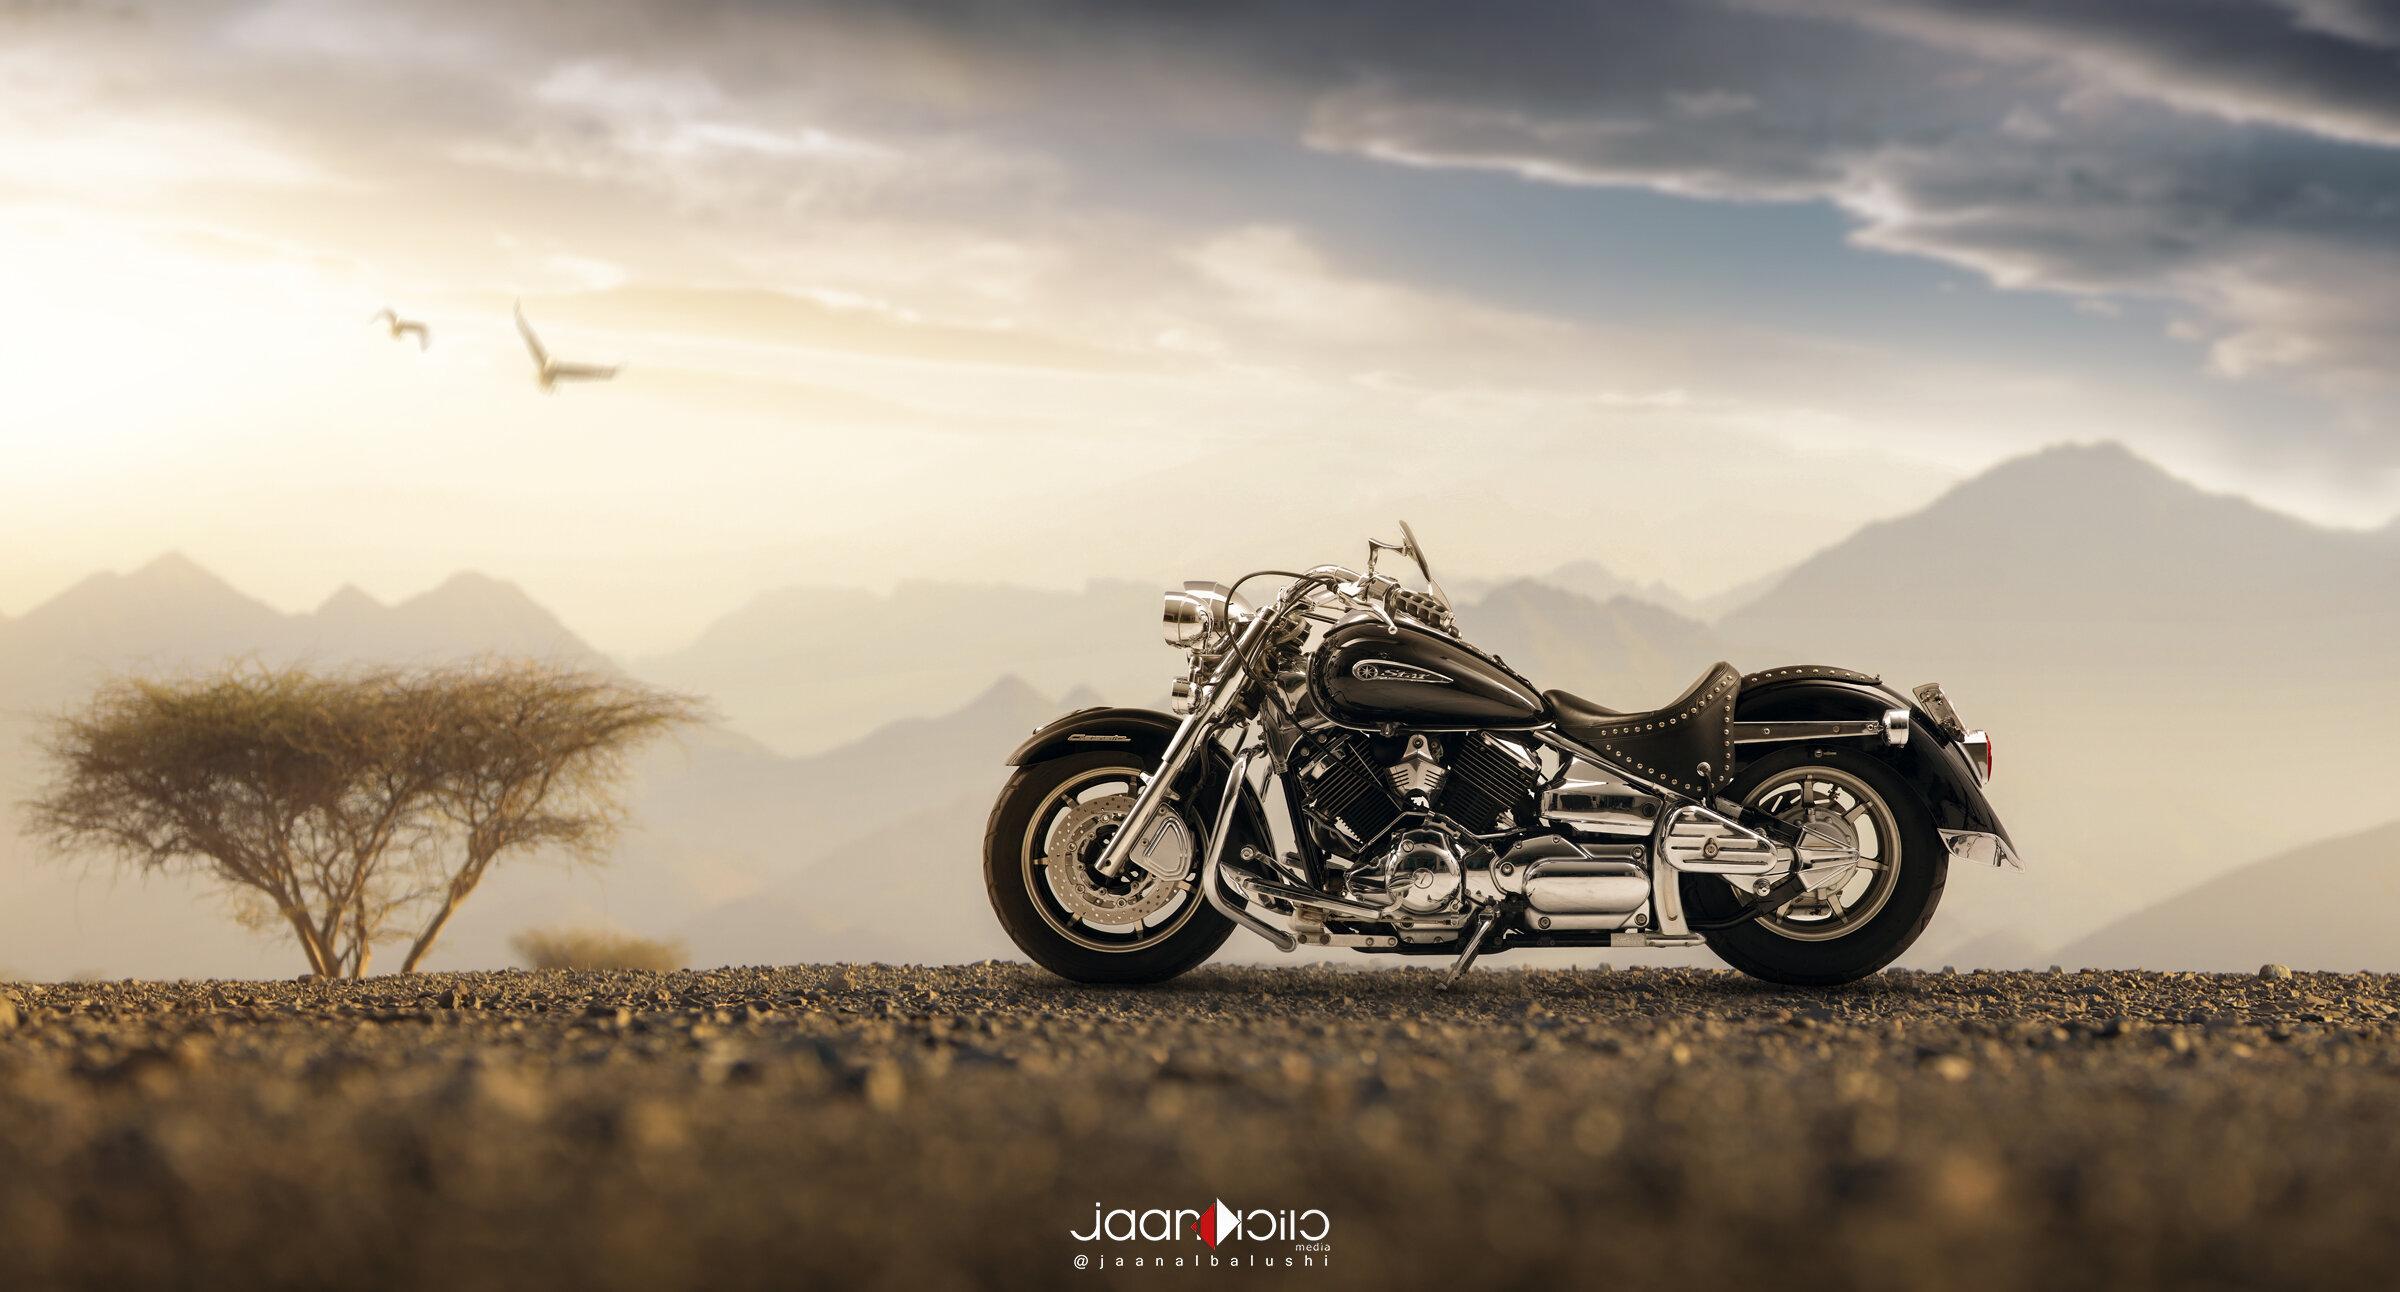 Yamaha Bika at oman copy.jpg